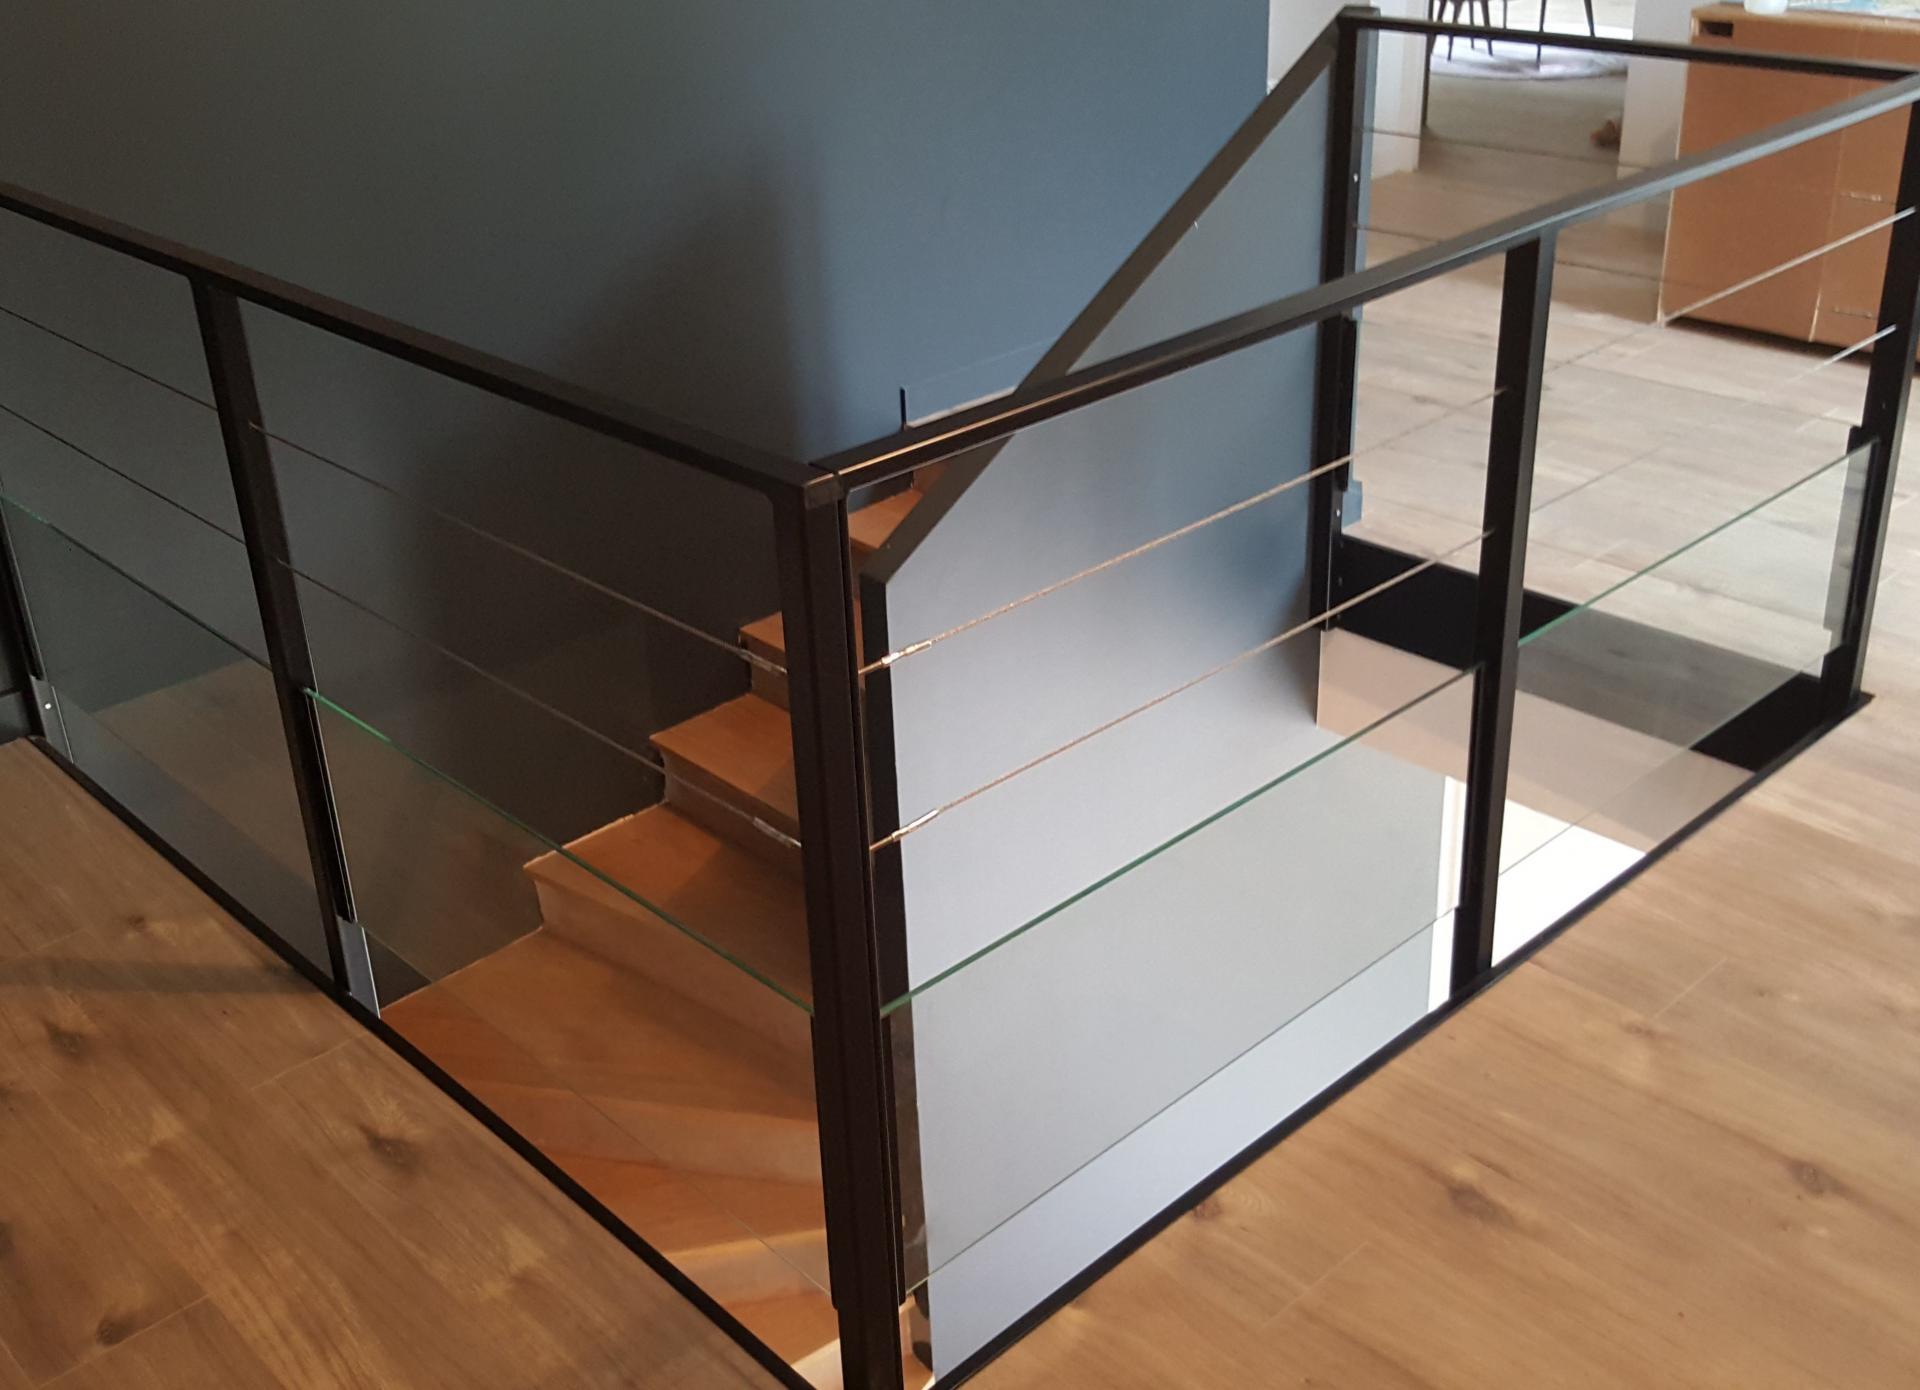 fabrication de garde corps morderne sur mesure ou standard. Black Bedroom Furniture Sets. Home Design Ideas